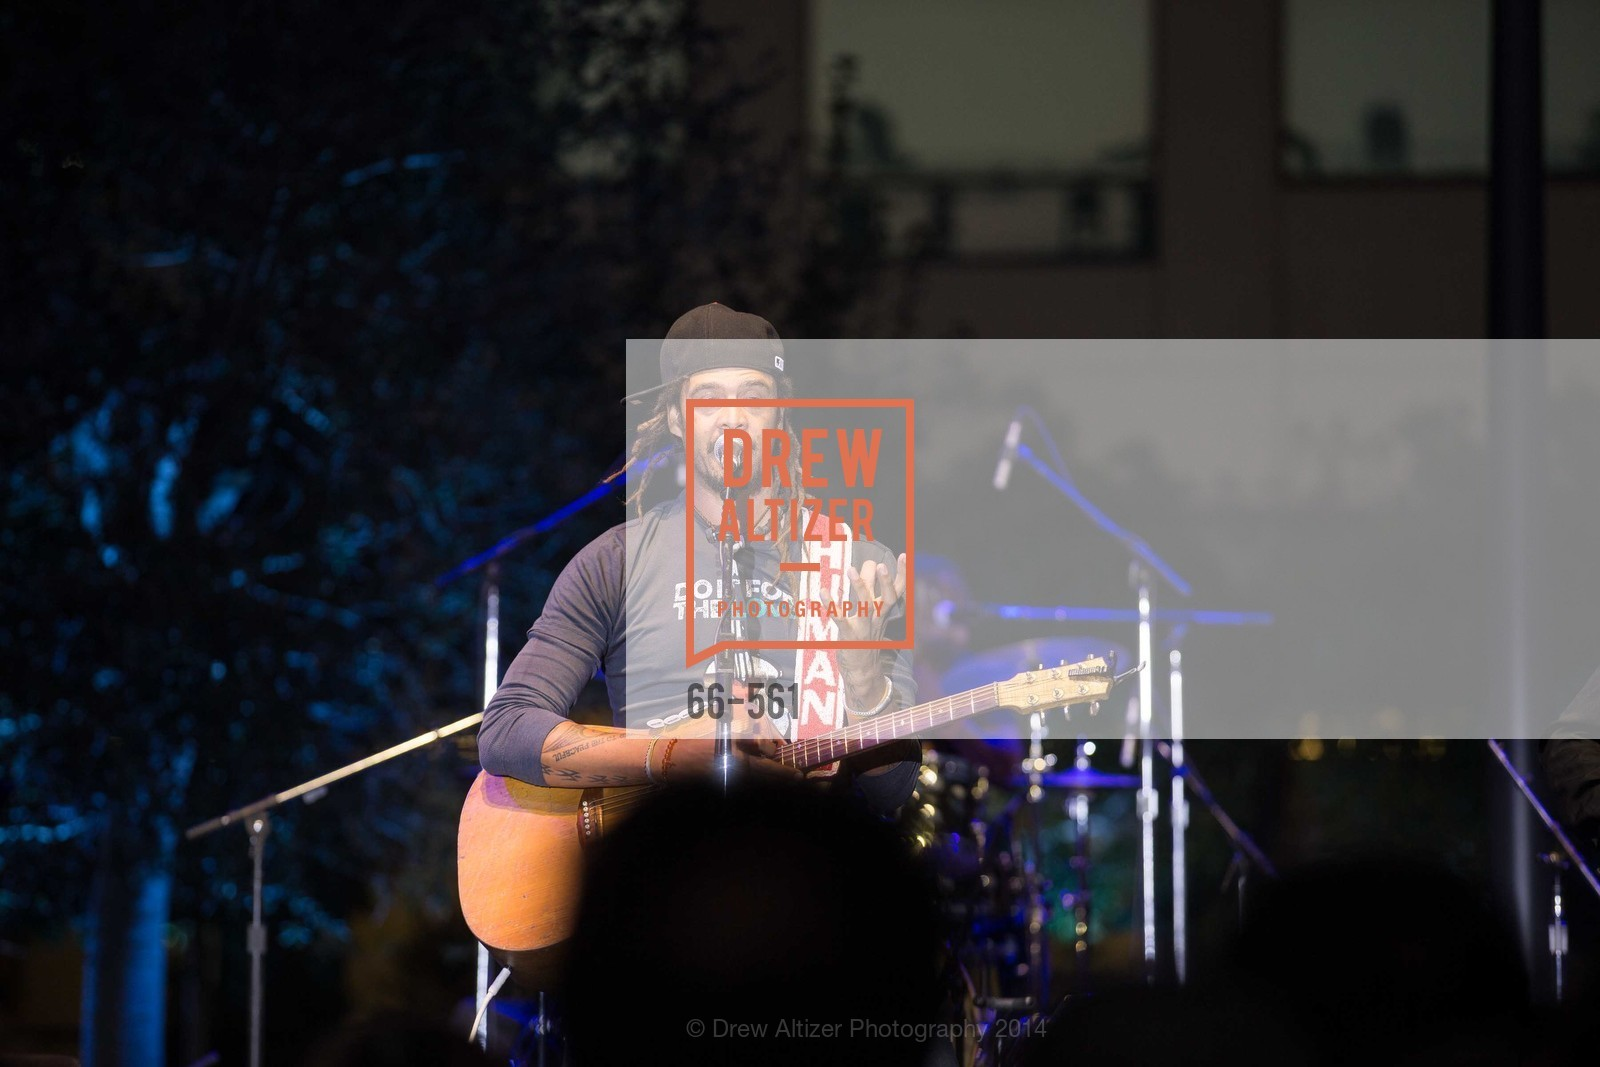 Performance By Michael Franti, Photo #66-561